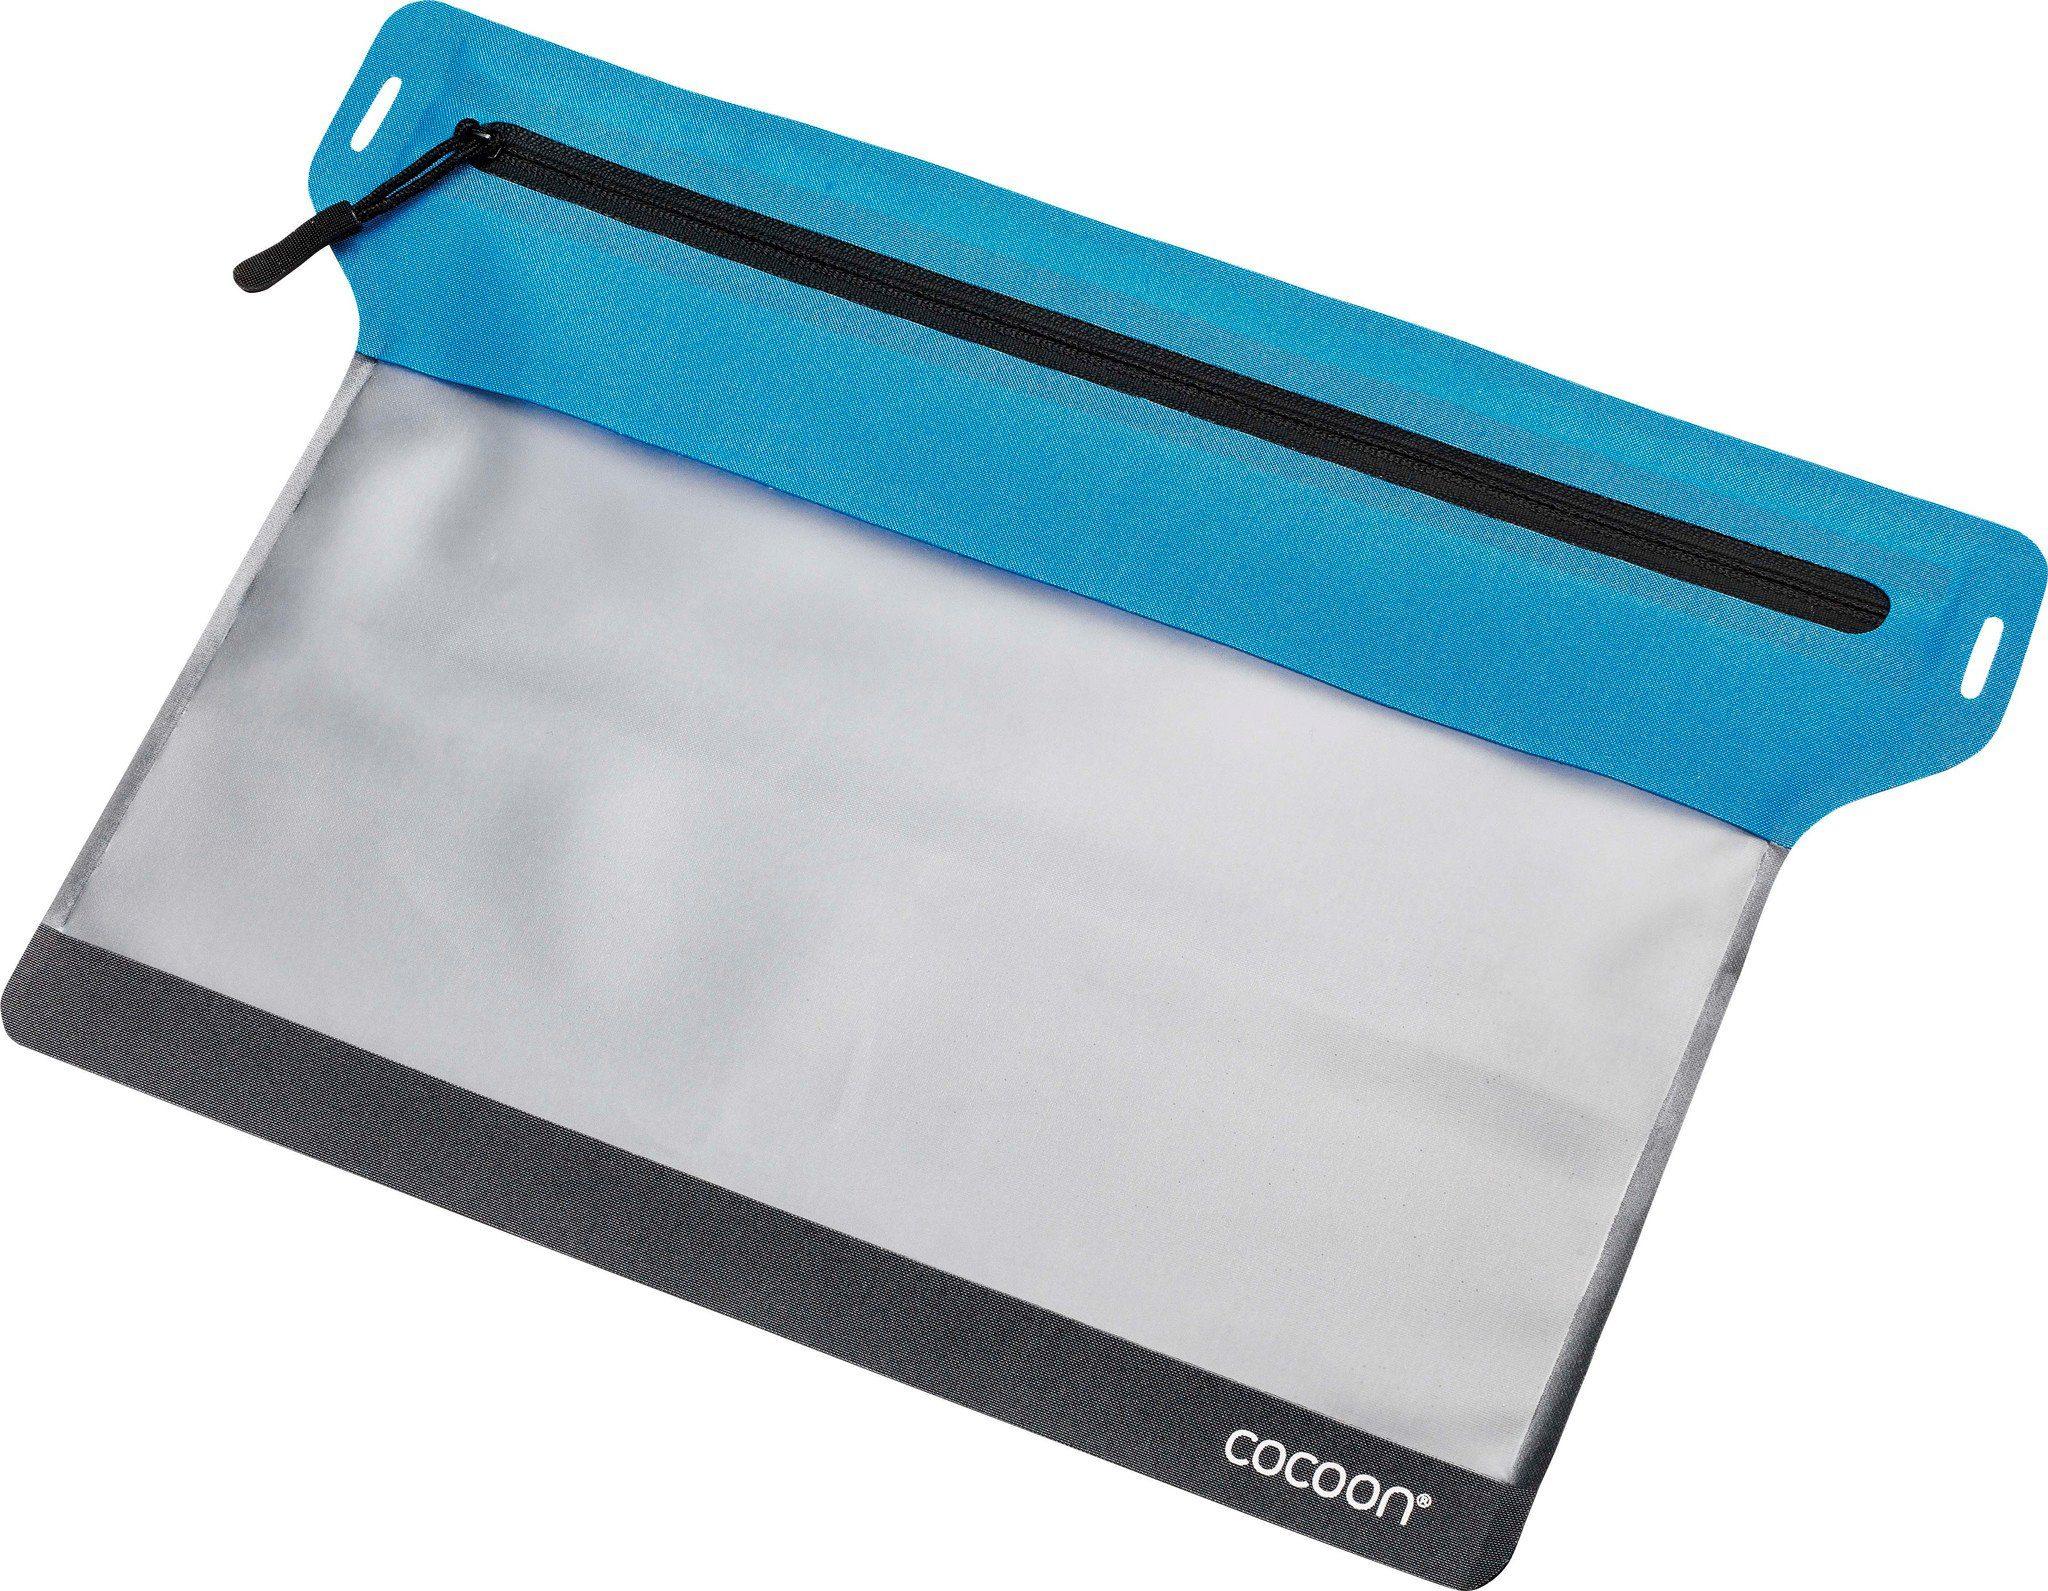 Cocoon Wertsachenaufbewahrung »Zippered Flat Document Bag Large«